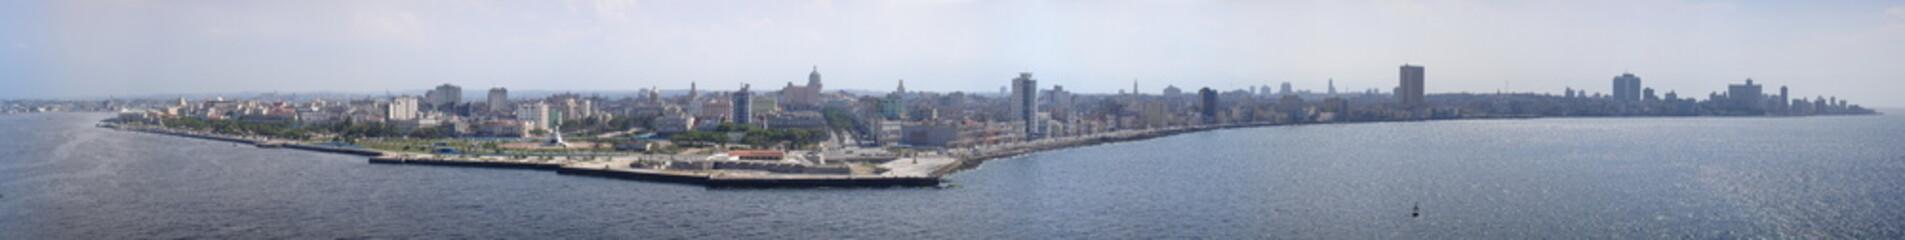 Havana panorama II